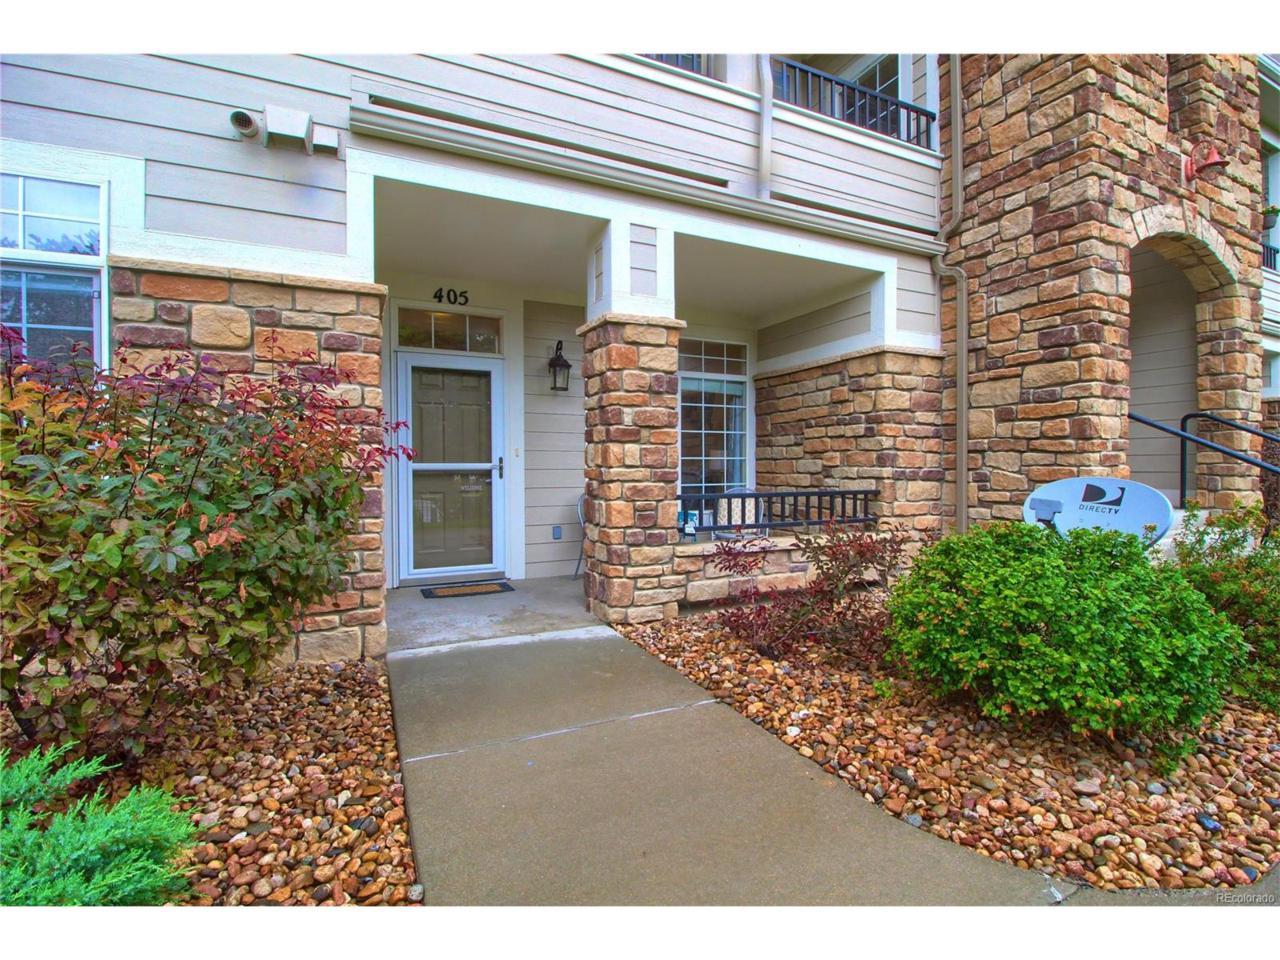 12711 Colorado Boulevard 405D, Thornton, CO 80241 (MLS #2665831) :: 8z Real Estate